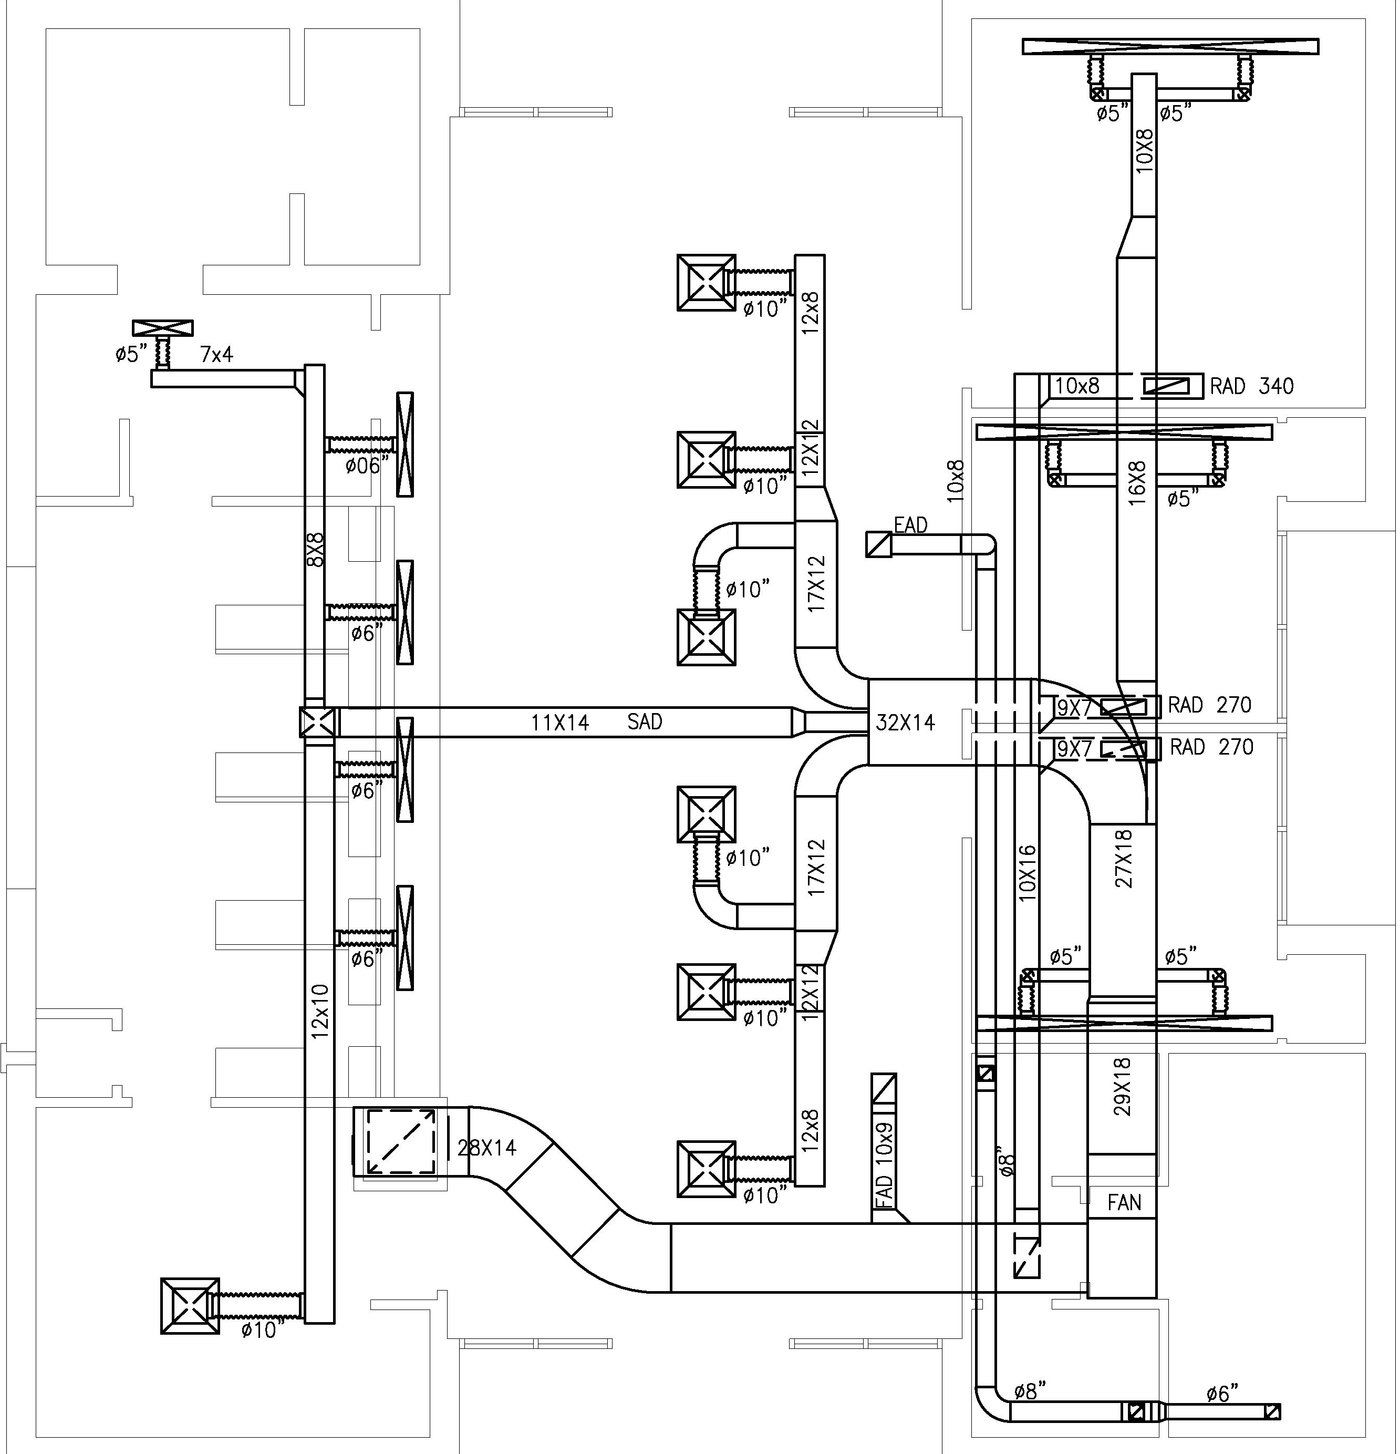 HVAC Plans by Raymond Alberga at Coroflot.com   Hvac design, Ventilation  design, Hvac system design   Hvac Drawing Plans      Pinterest